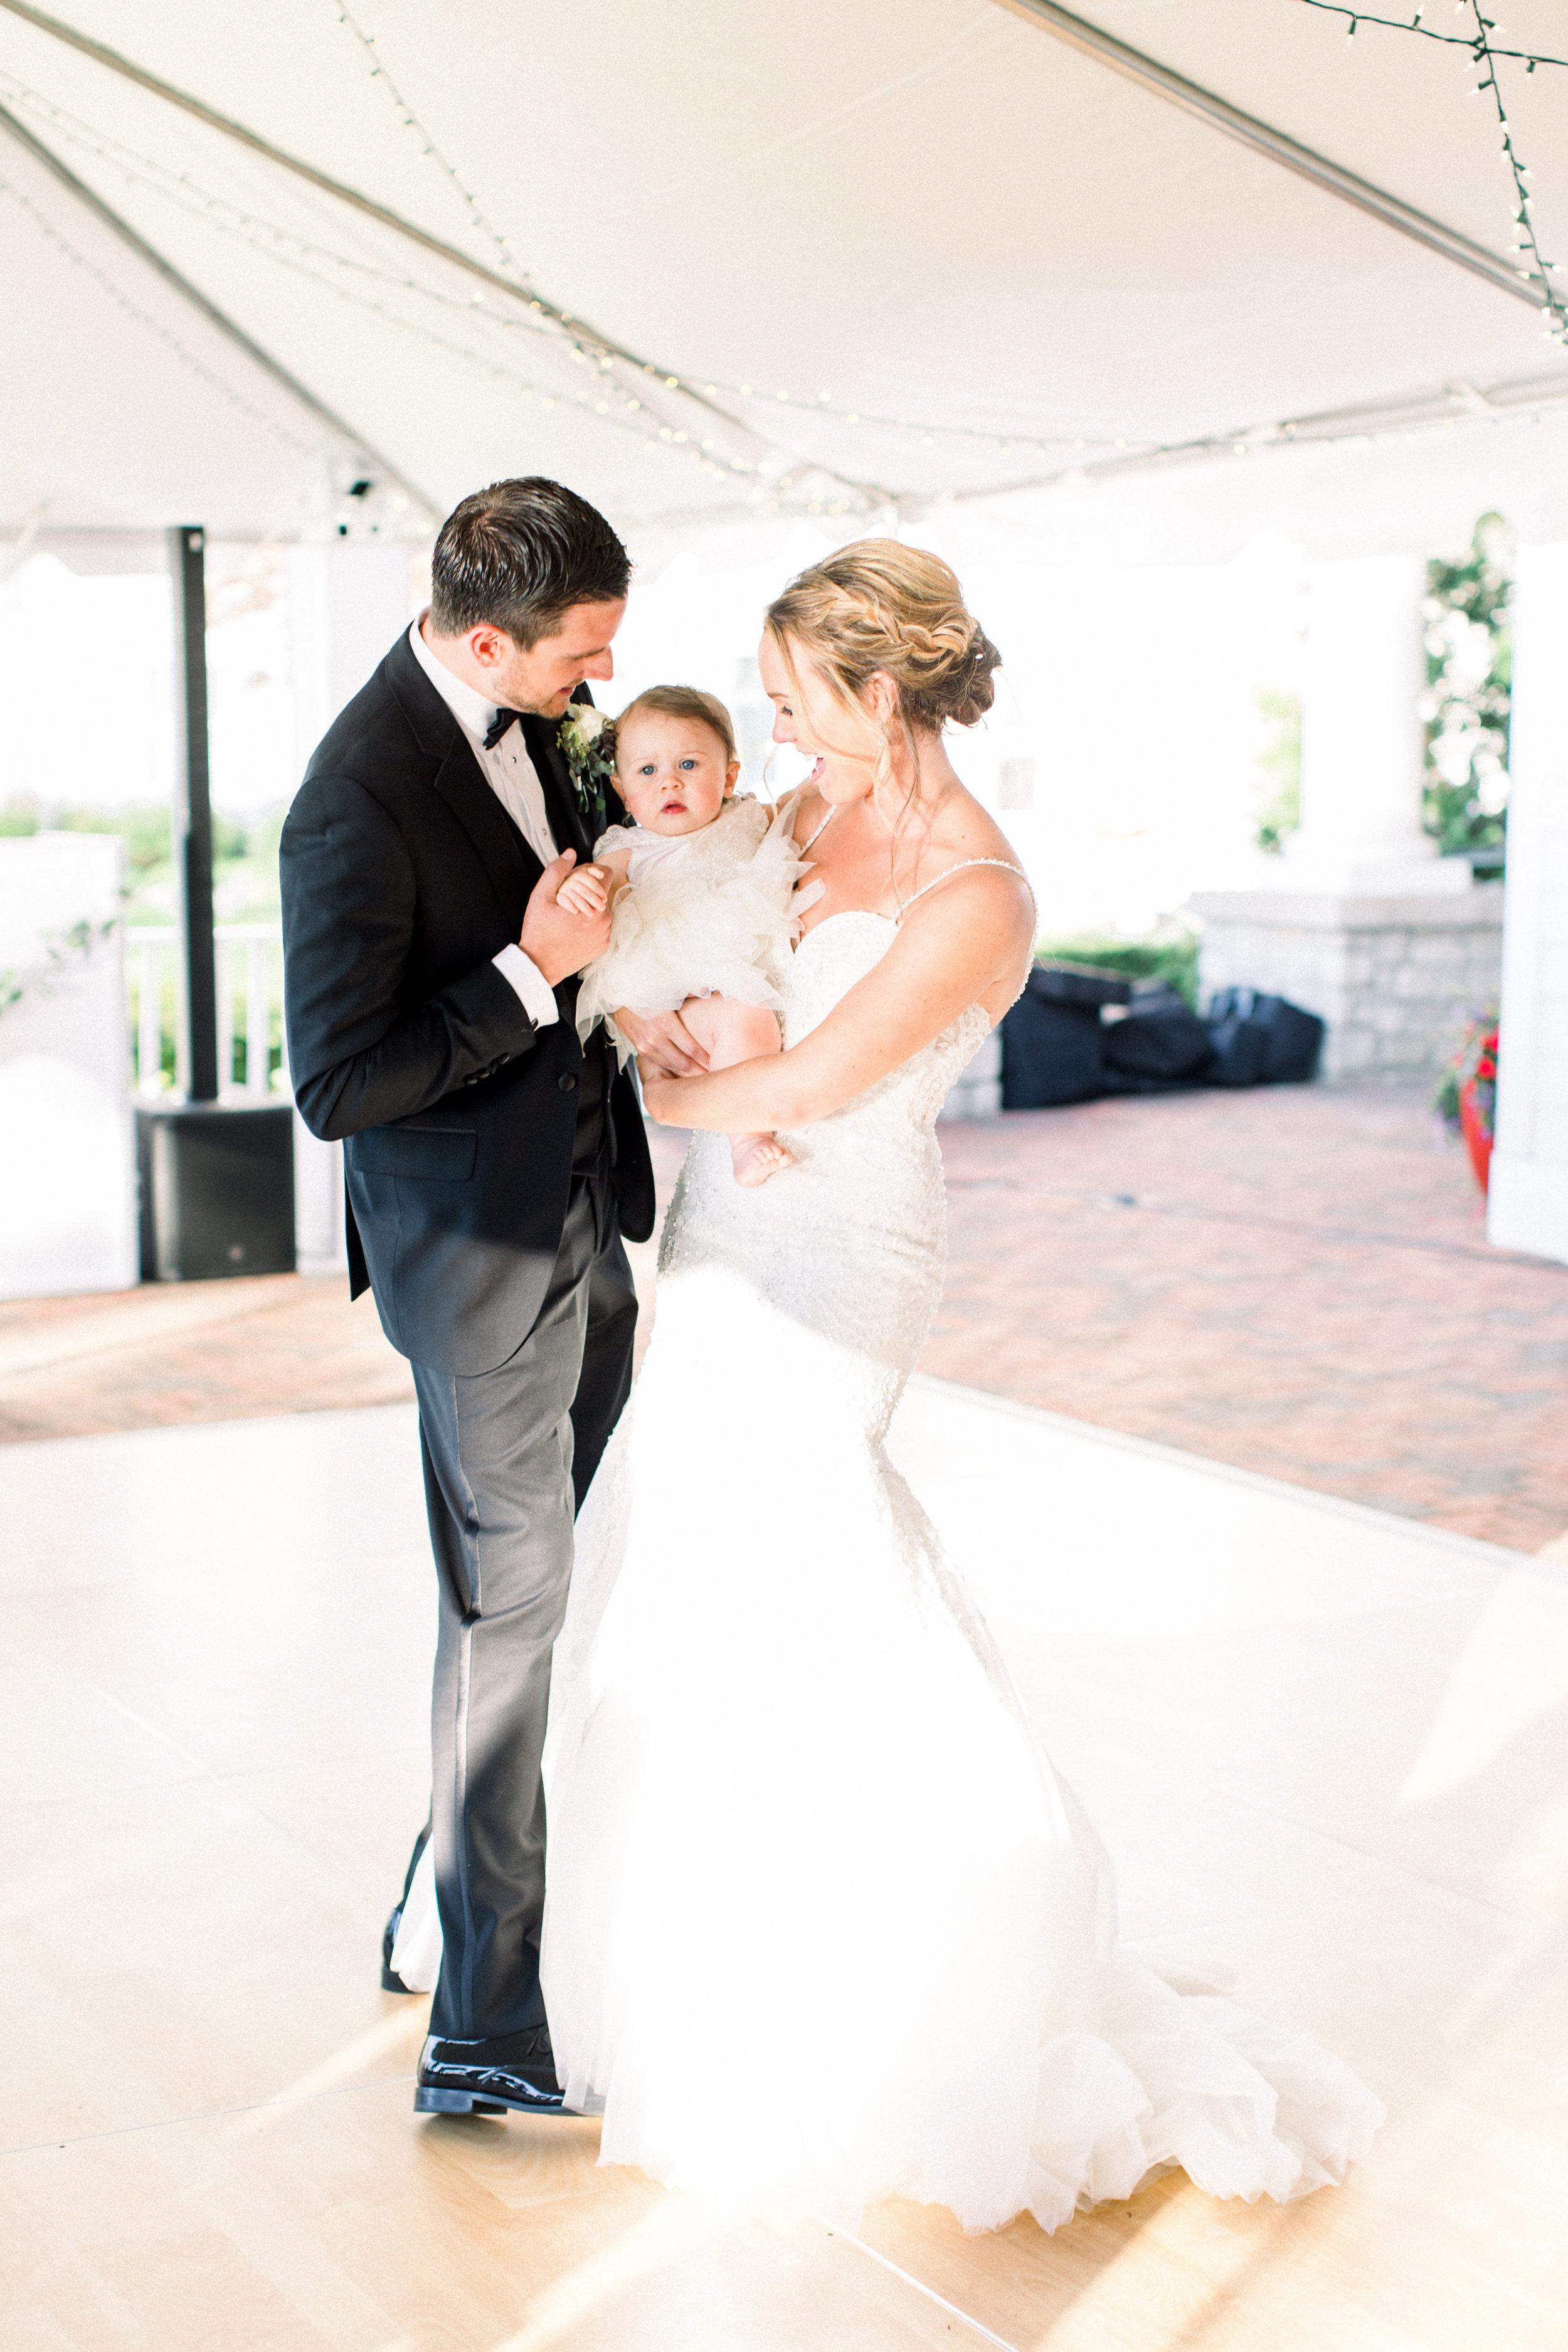 Noss+Wedding+Reception+ Dances-8.jpg